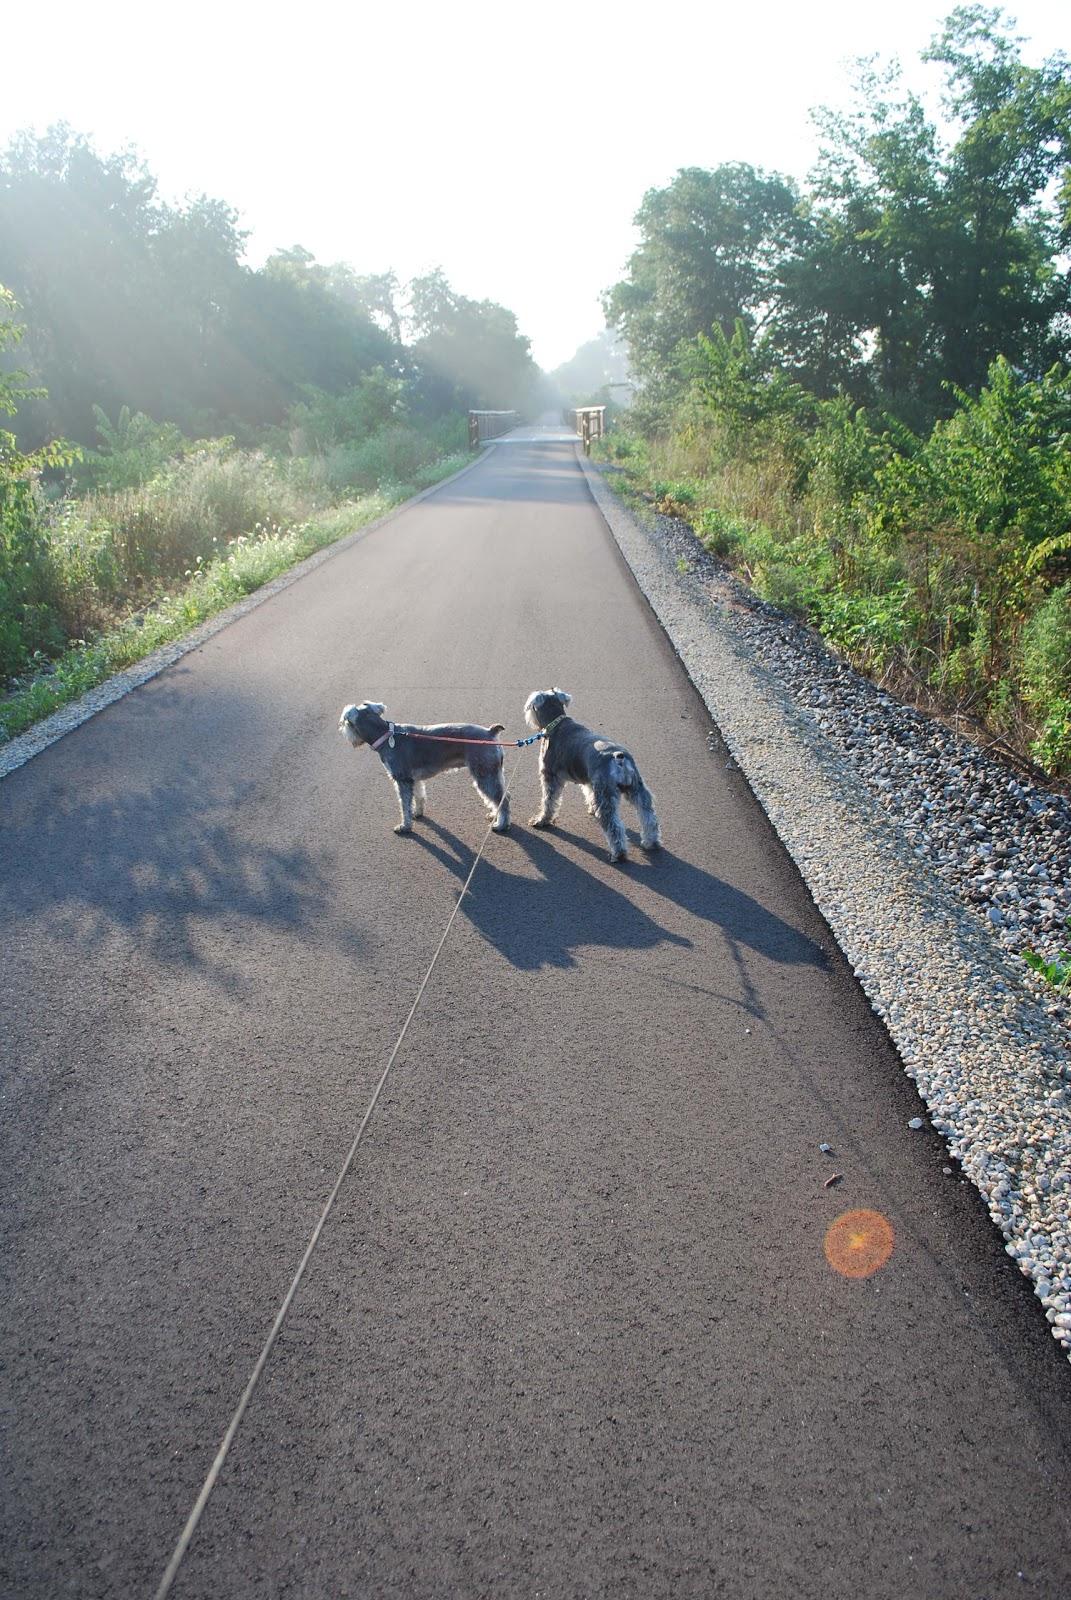 http://1.bp.blogspot.com/-i61xLBLu9kU/TleQ1fHUmBI/AAAAAAAAEHU/lGWDk81-_LI/s1600/bike+path+dogs.jpg